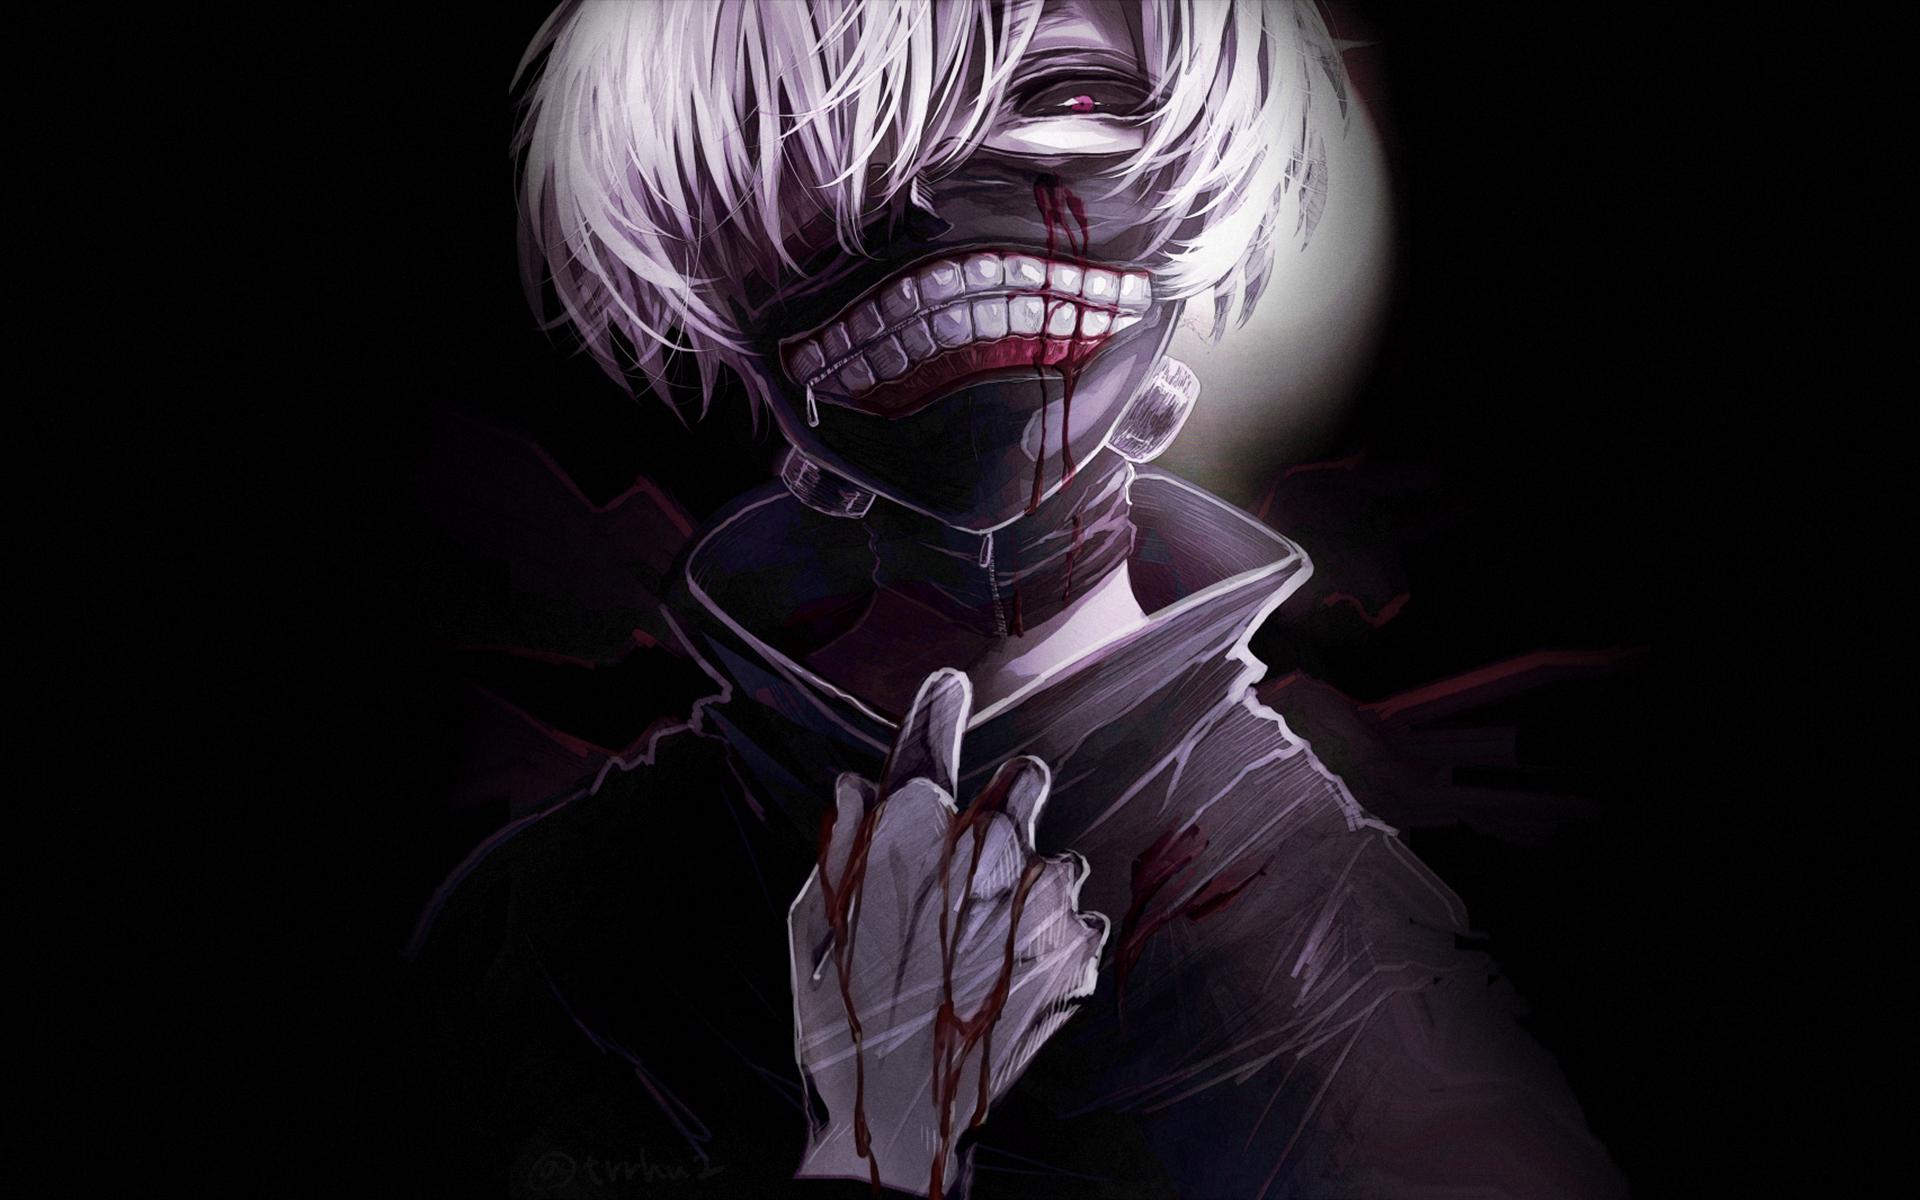 Tokyo Ghoul Bakgrundsbilder ID712825